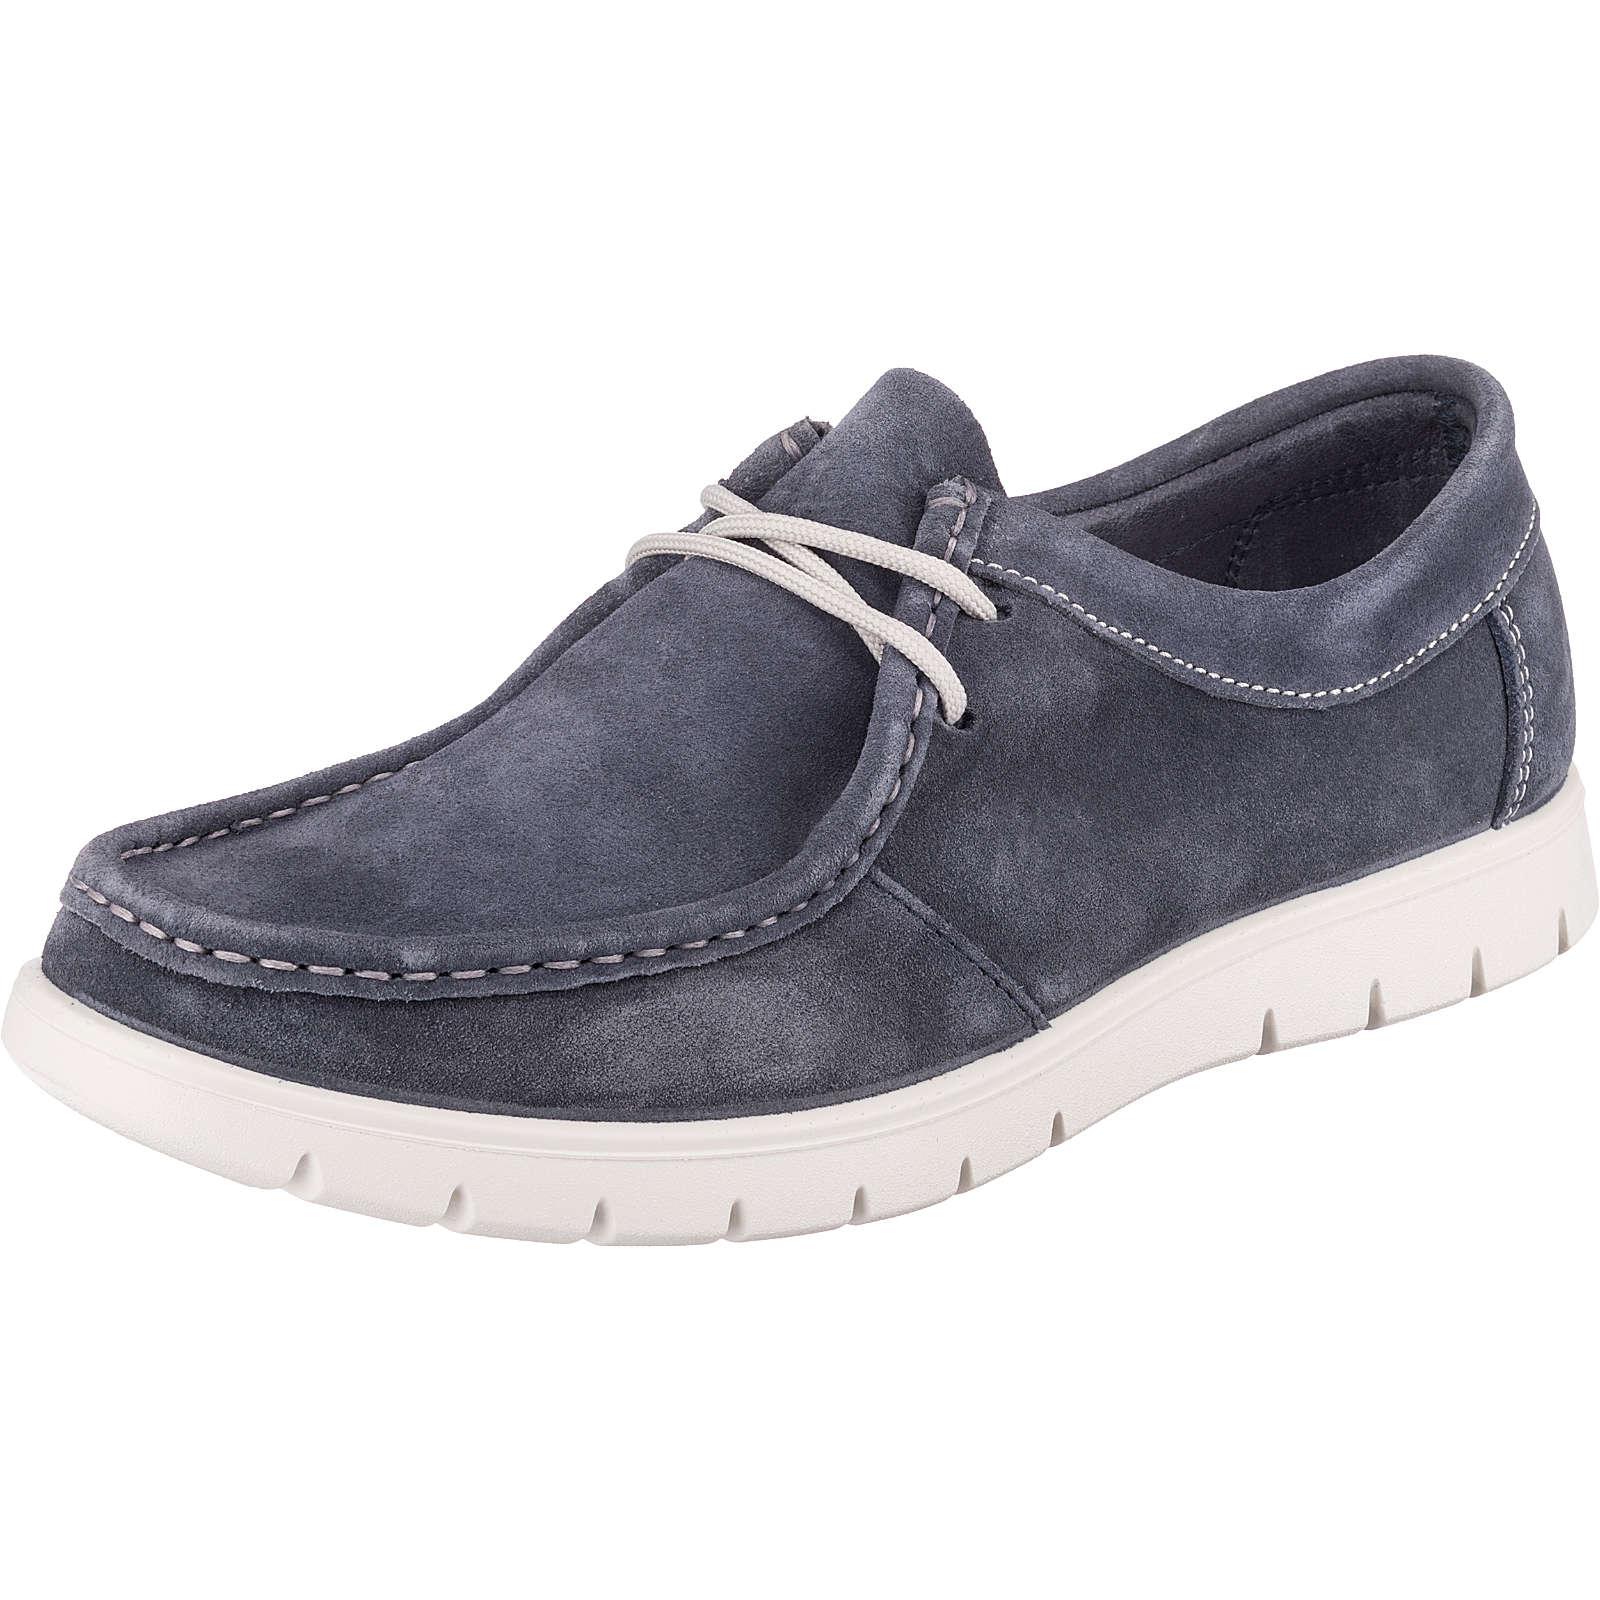 IGI & CO Usx 51155 Komfort-Halbschuhe blau Herren Gr. 41